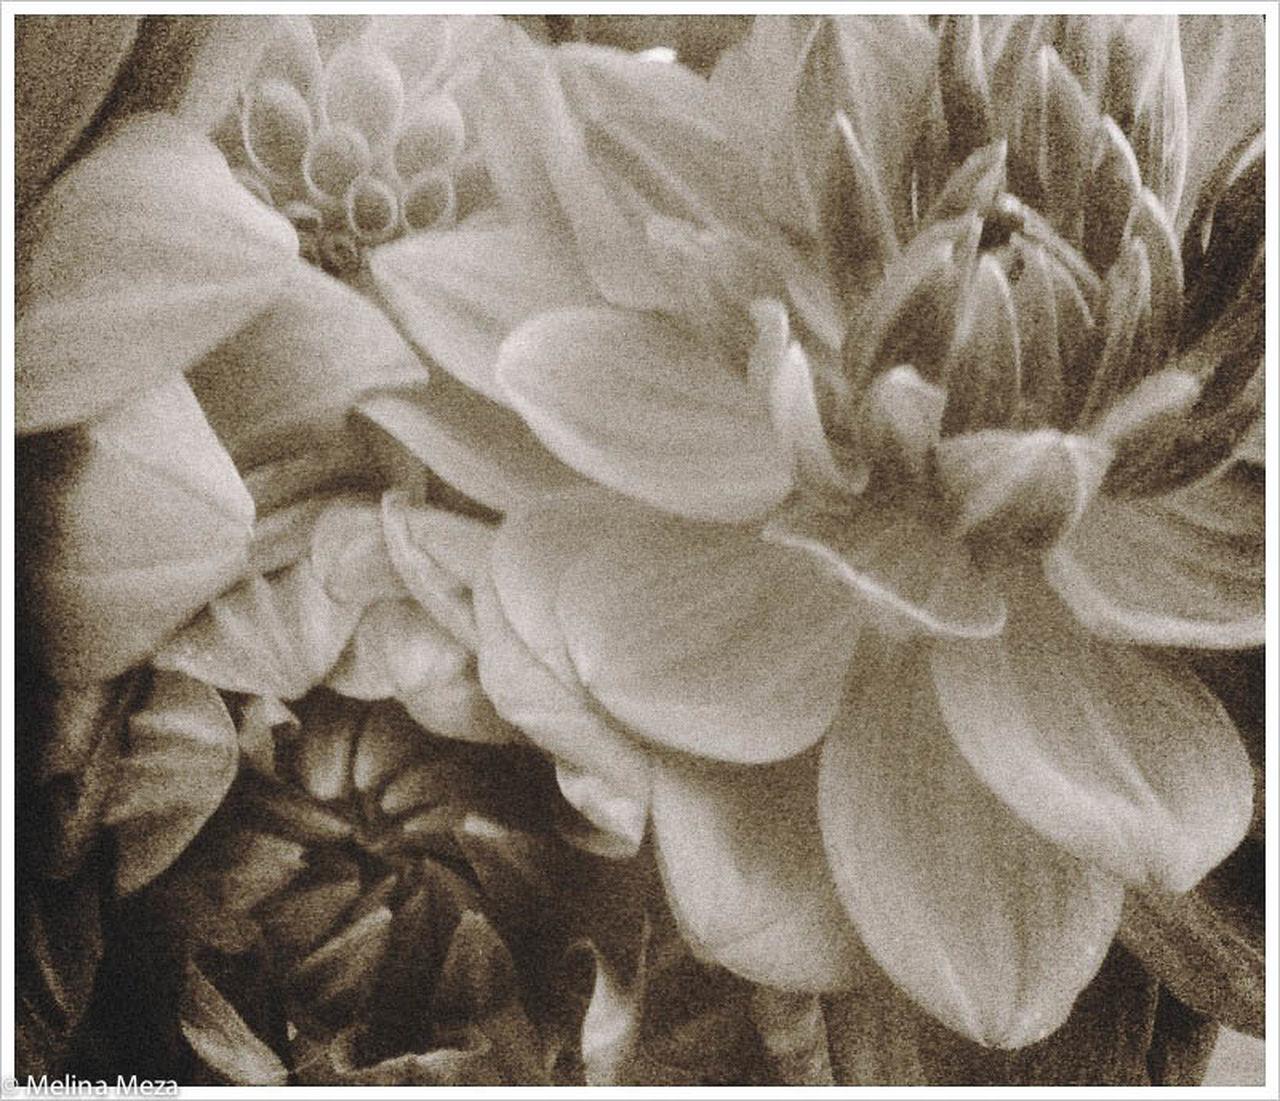 Sepia Dahlias Botany Dahlias Elégance Indoors  Macro Softness Springtime Vintage Looking Dahlias, Flowers, Boquet Of Flowers,